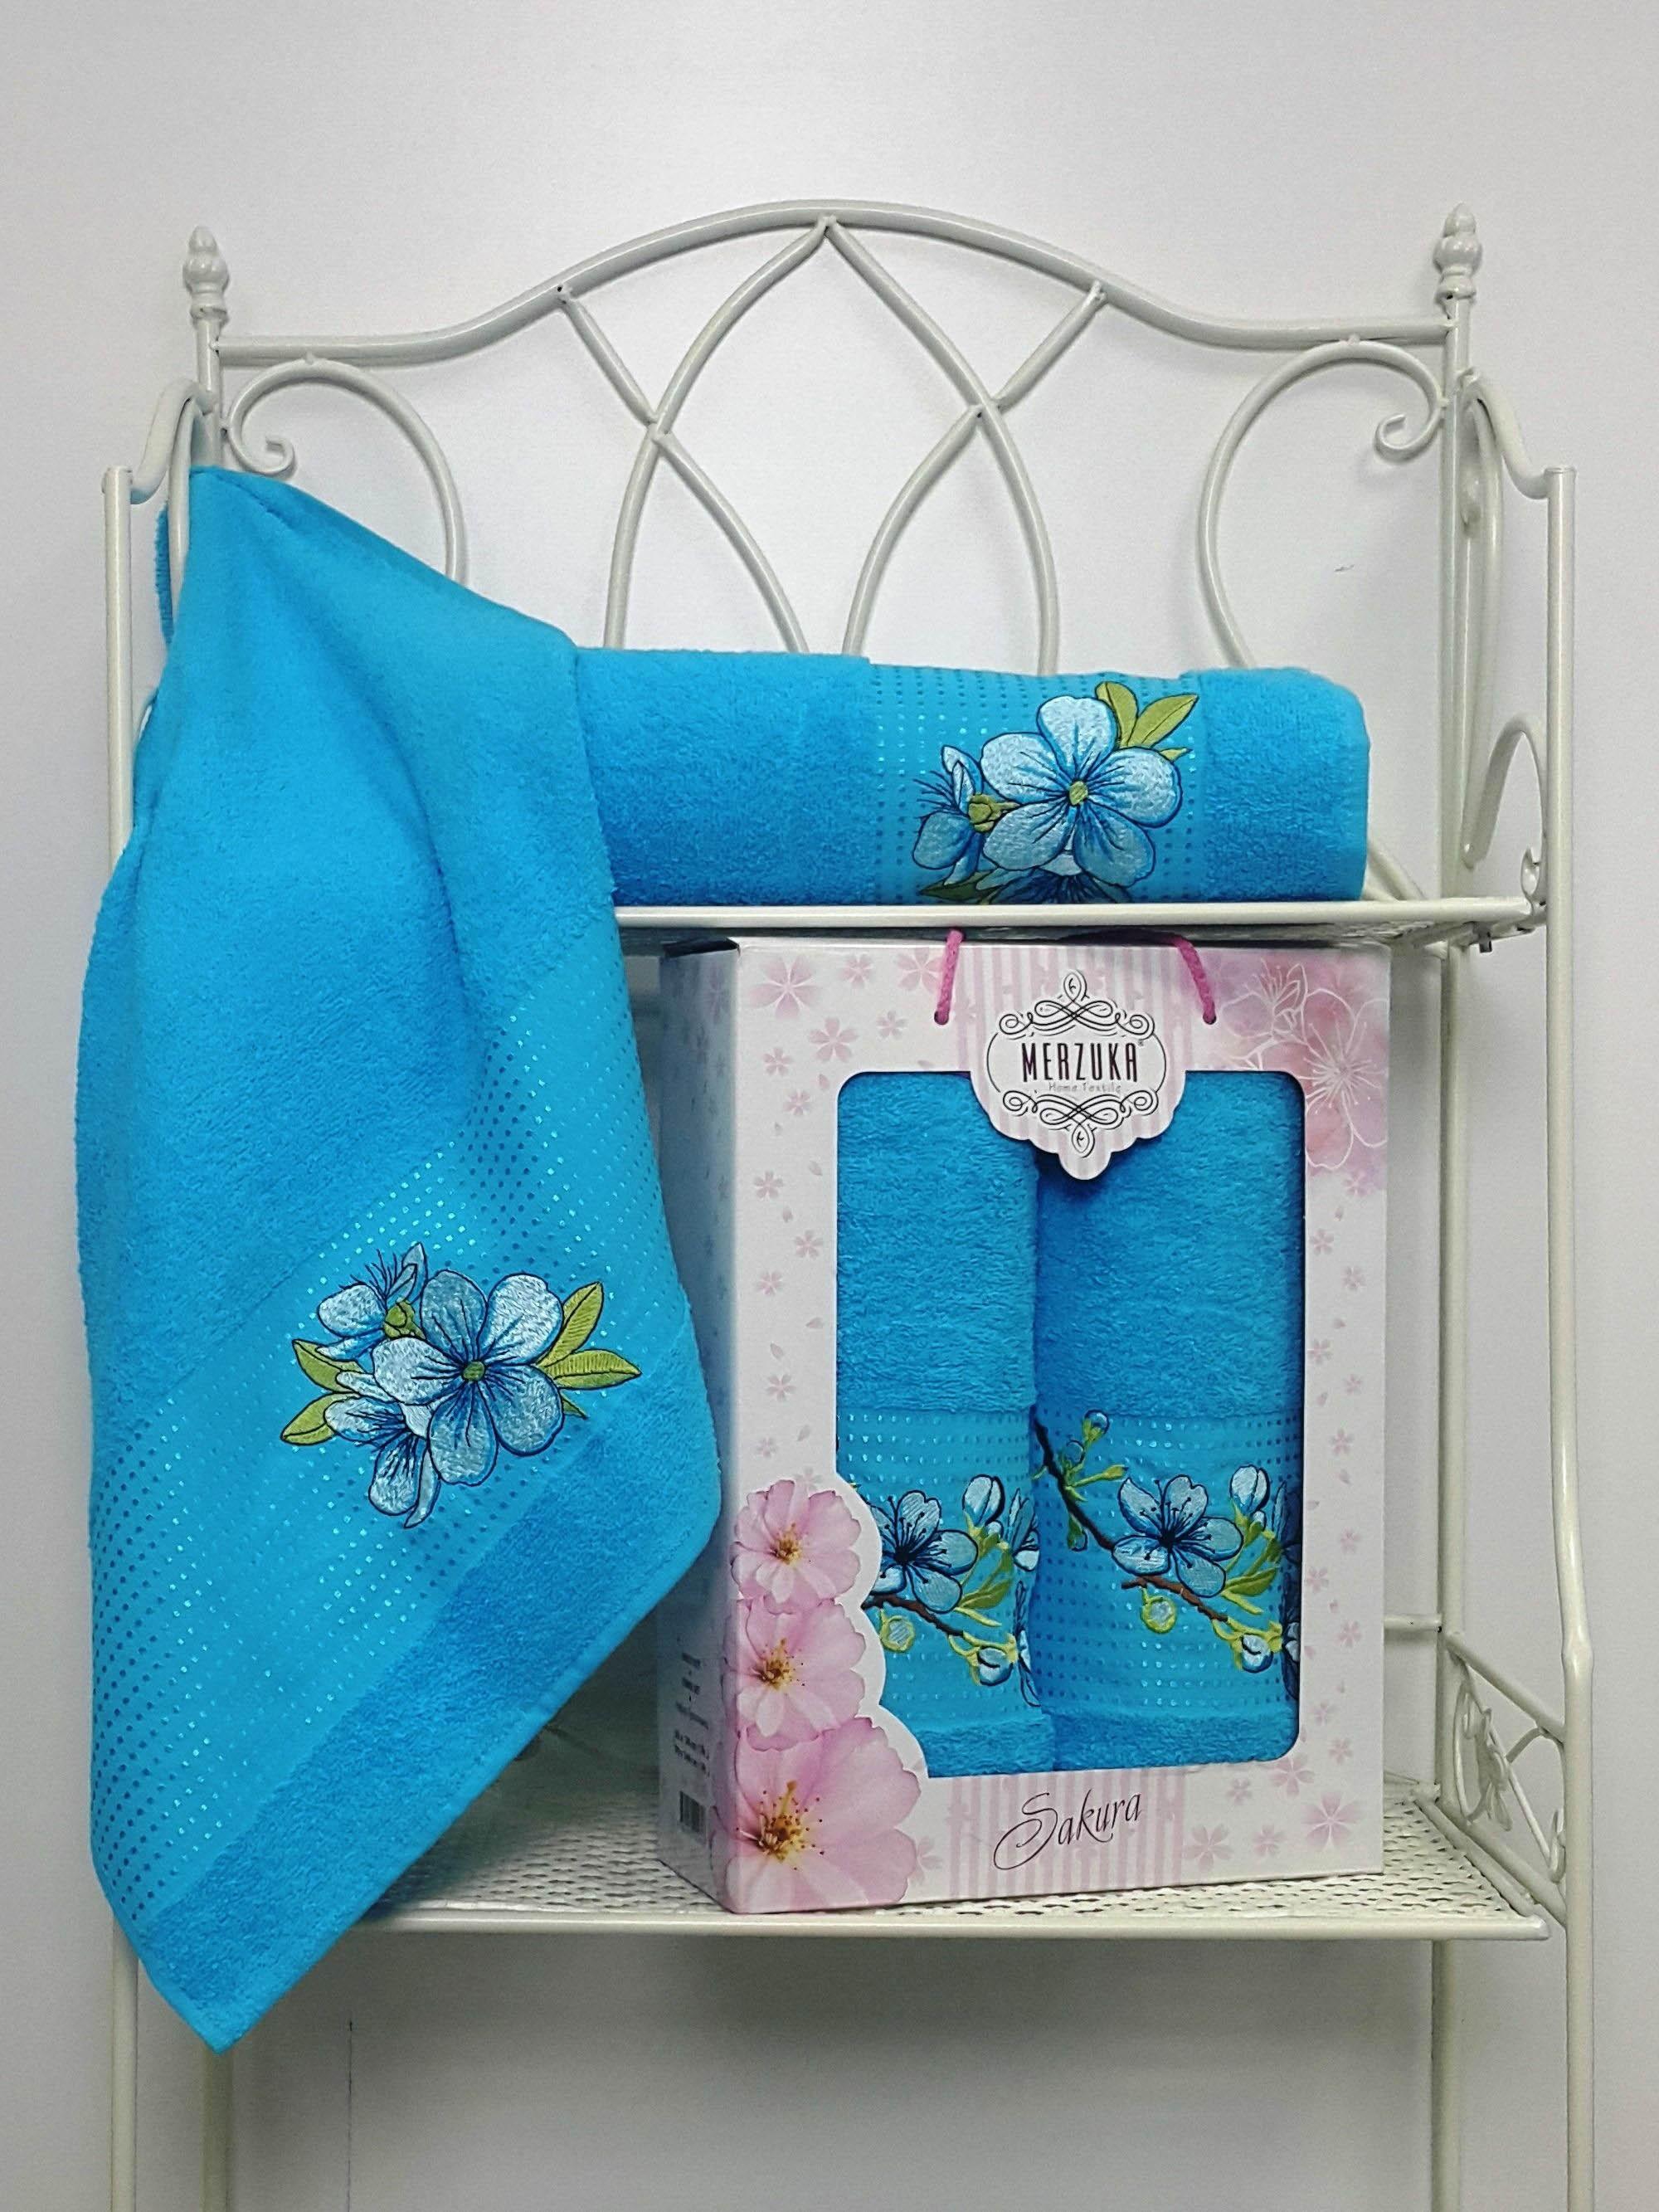 Полотенца Oran Merzuka Полотенце Sakura Цвет: Бирюзовый (Набор) набор из 3 полотенец merzuka sakura 50х90 2 70х140 8432 розовый